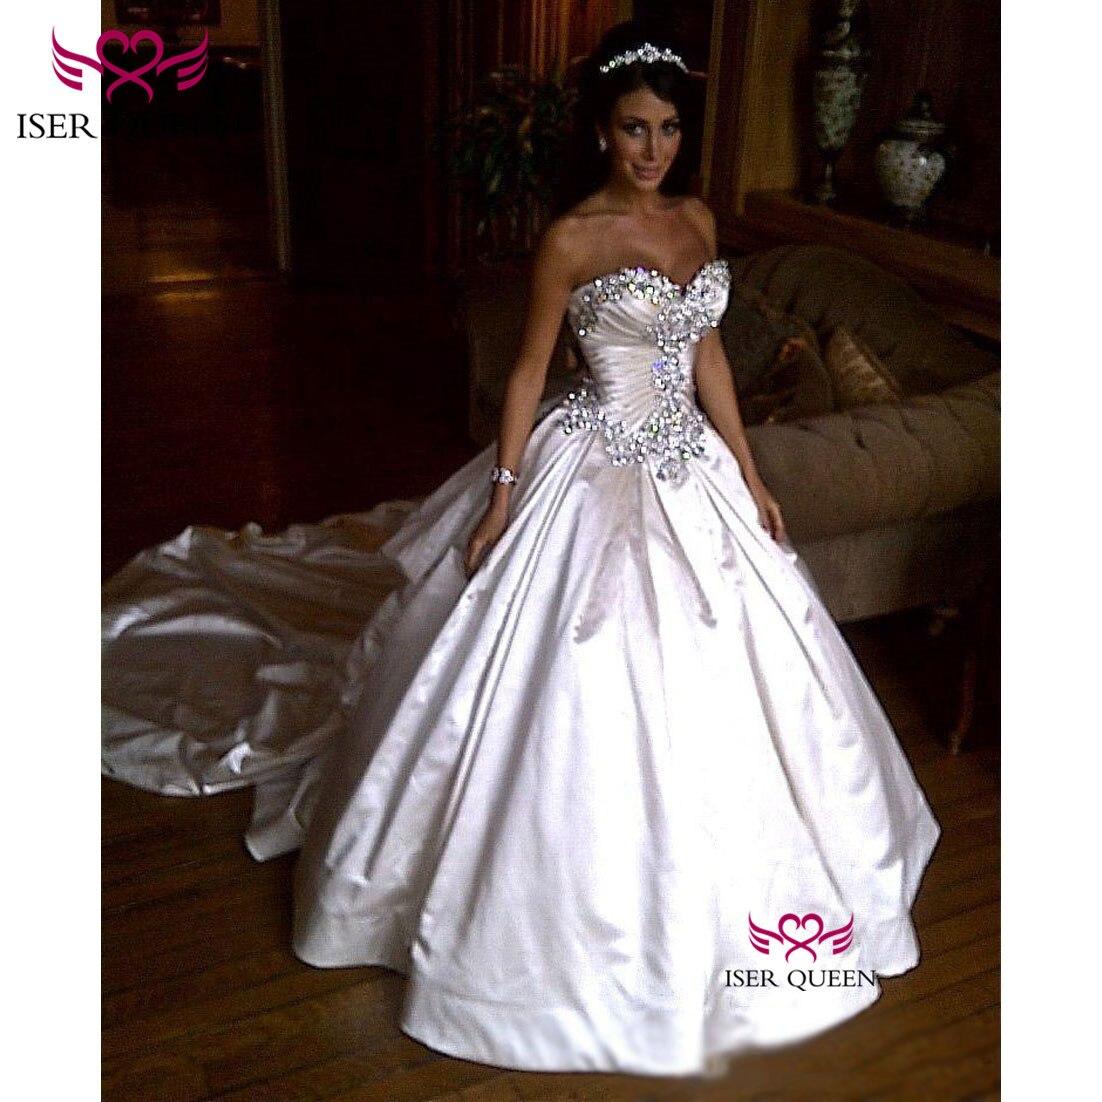 Luxury Champagne Lustrous Satin Wedding Dress Crystal Sweetheart Neckline Wedding Gown Pleat Ball Gown Bride Dress W0345